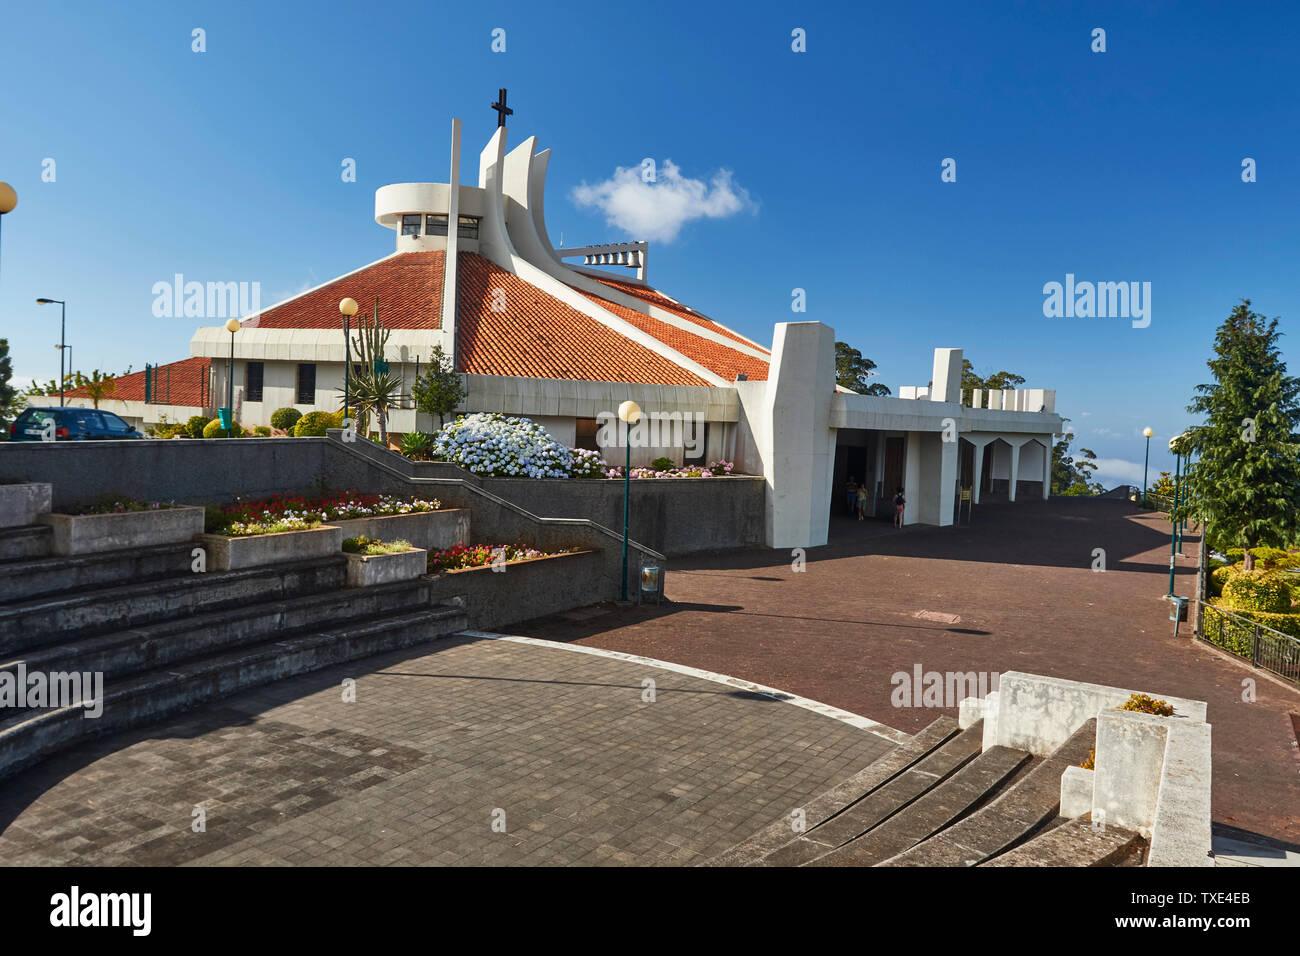 Camacha Pfarrkirche, Camacha, Madeira, Portugal, Europäische Union Stockfoto